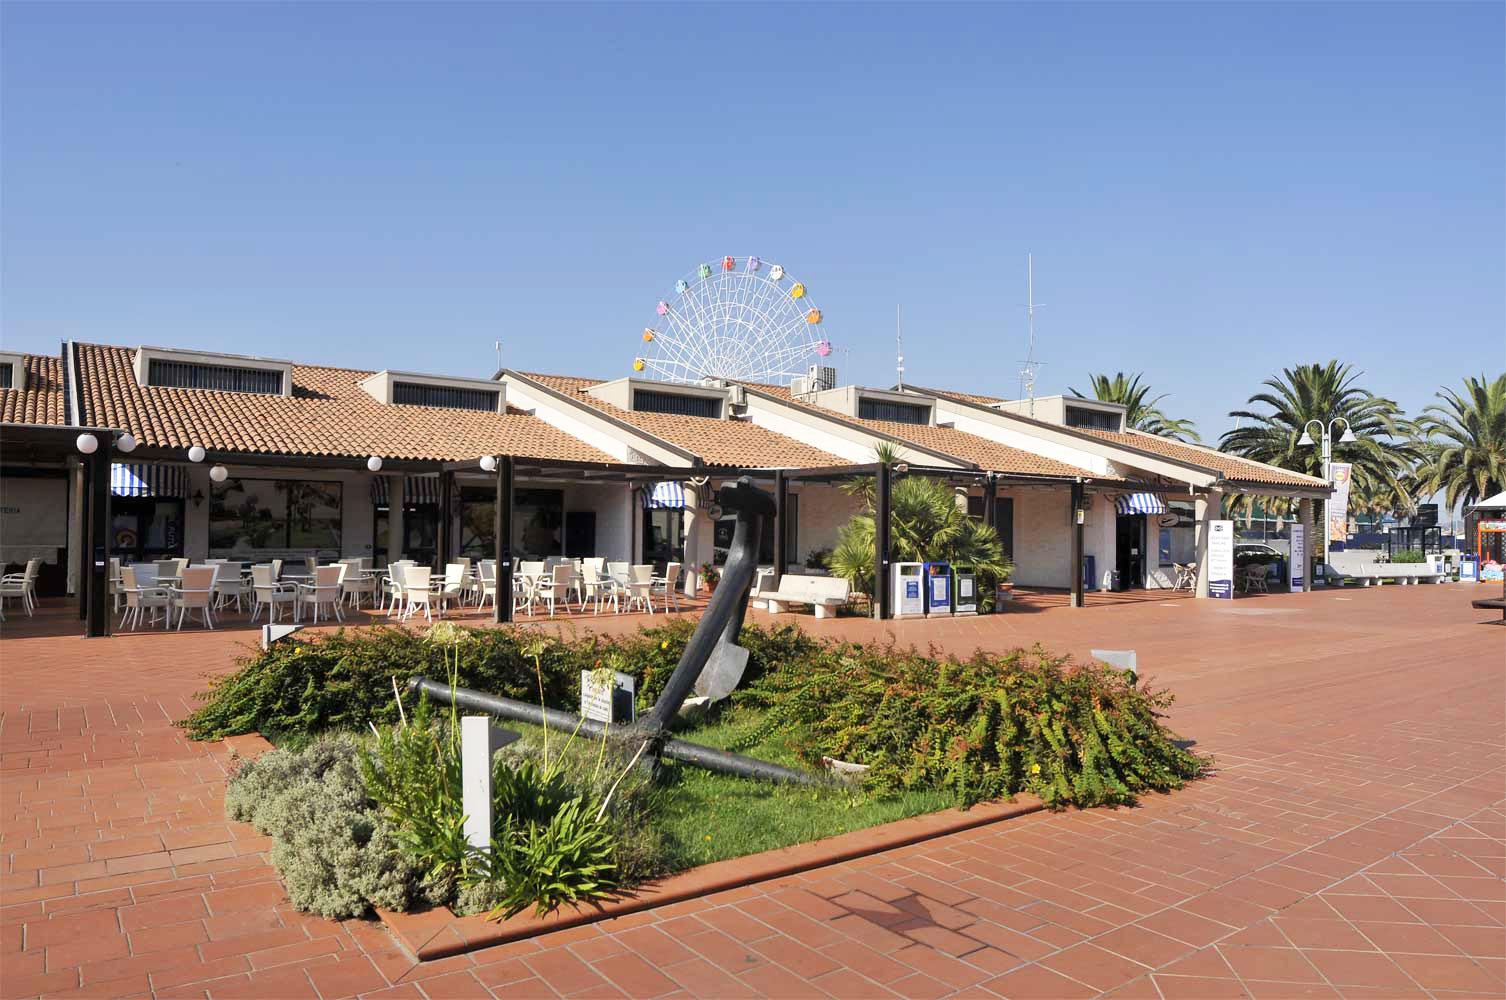 Pescara Camera Live : Marina di pescara